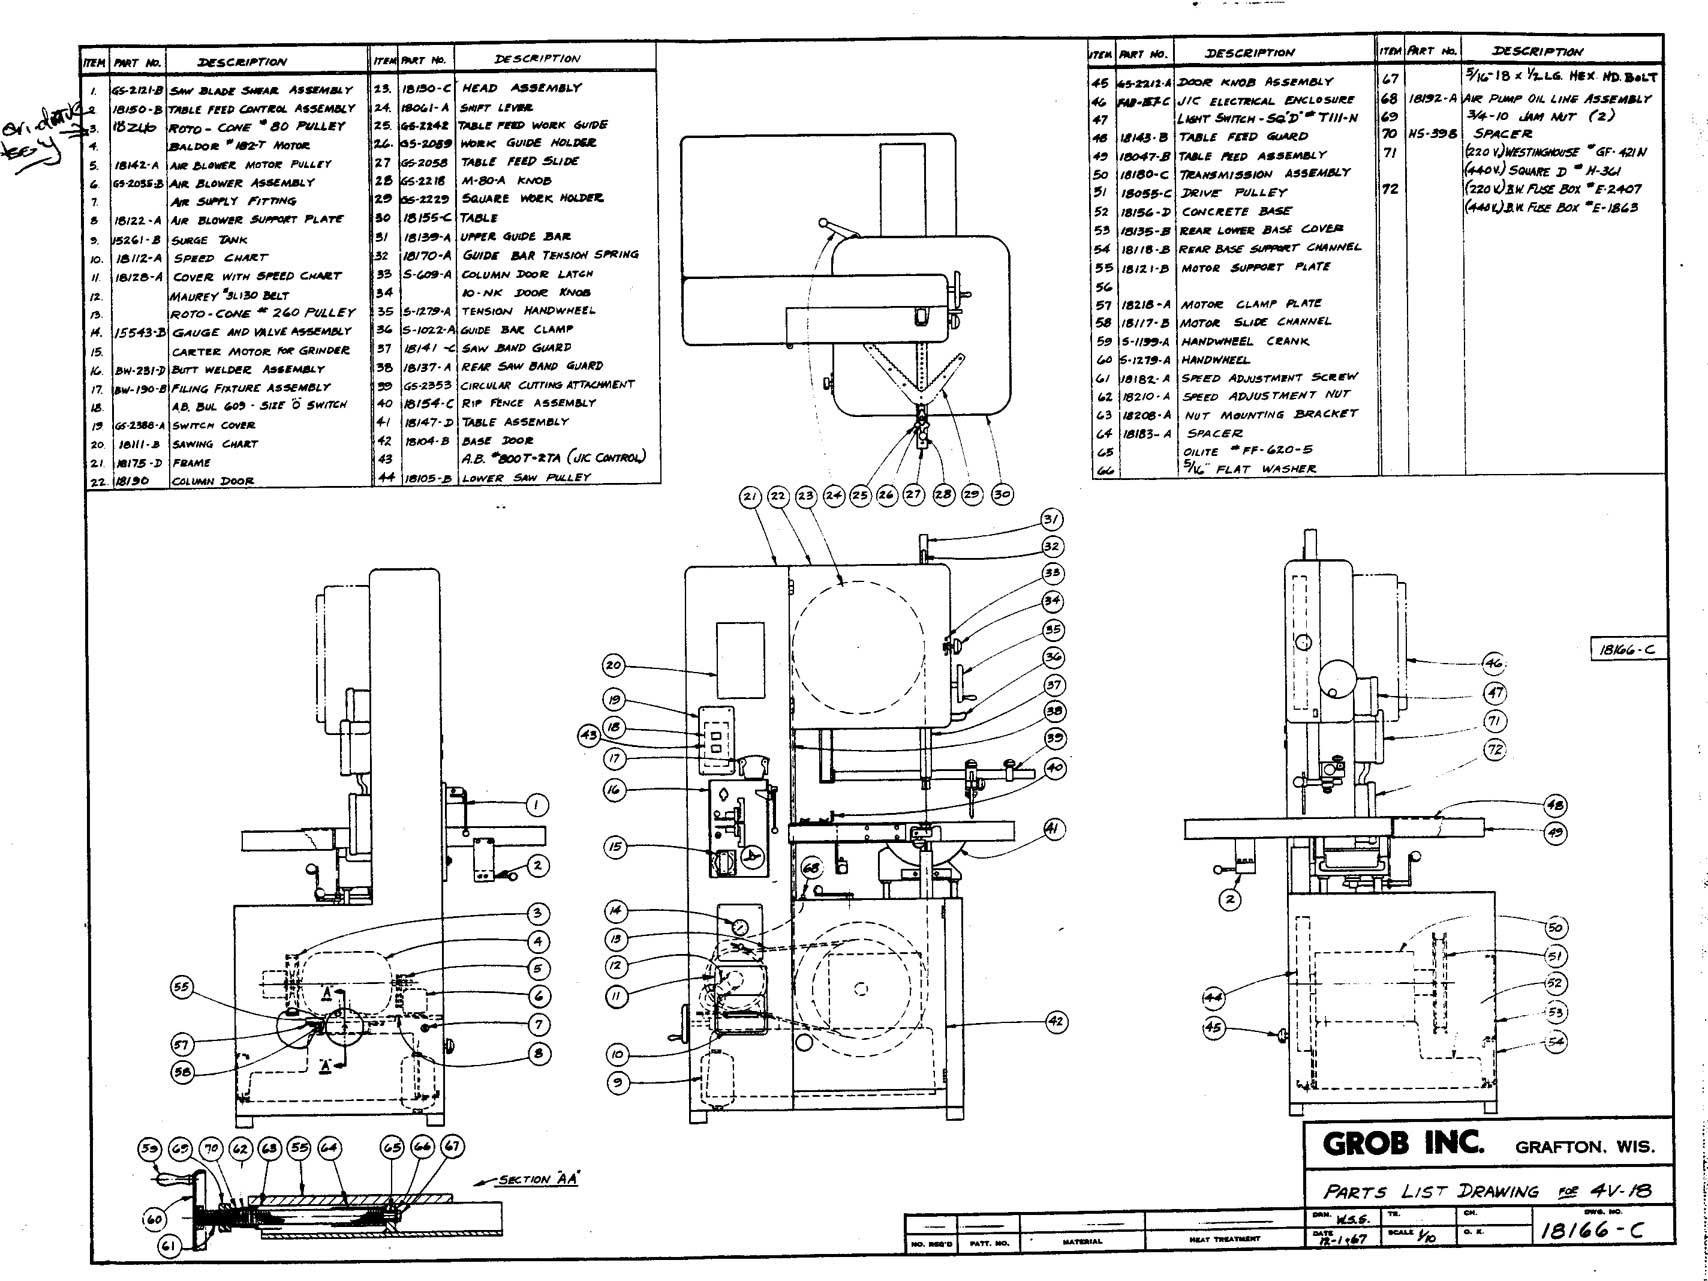 Diagram 2007 Pontiac Grand Prix Headlight Wiring Diagram Full Version Hd Quality Wiring Diagram Blogxbelk Trkbrd It